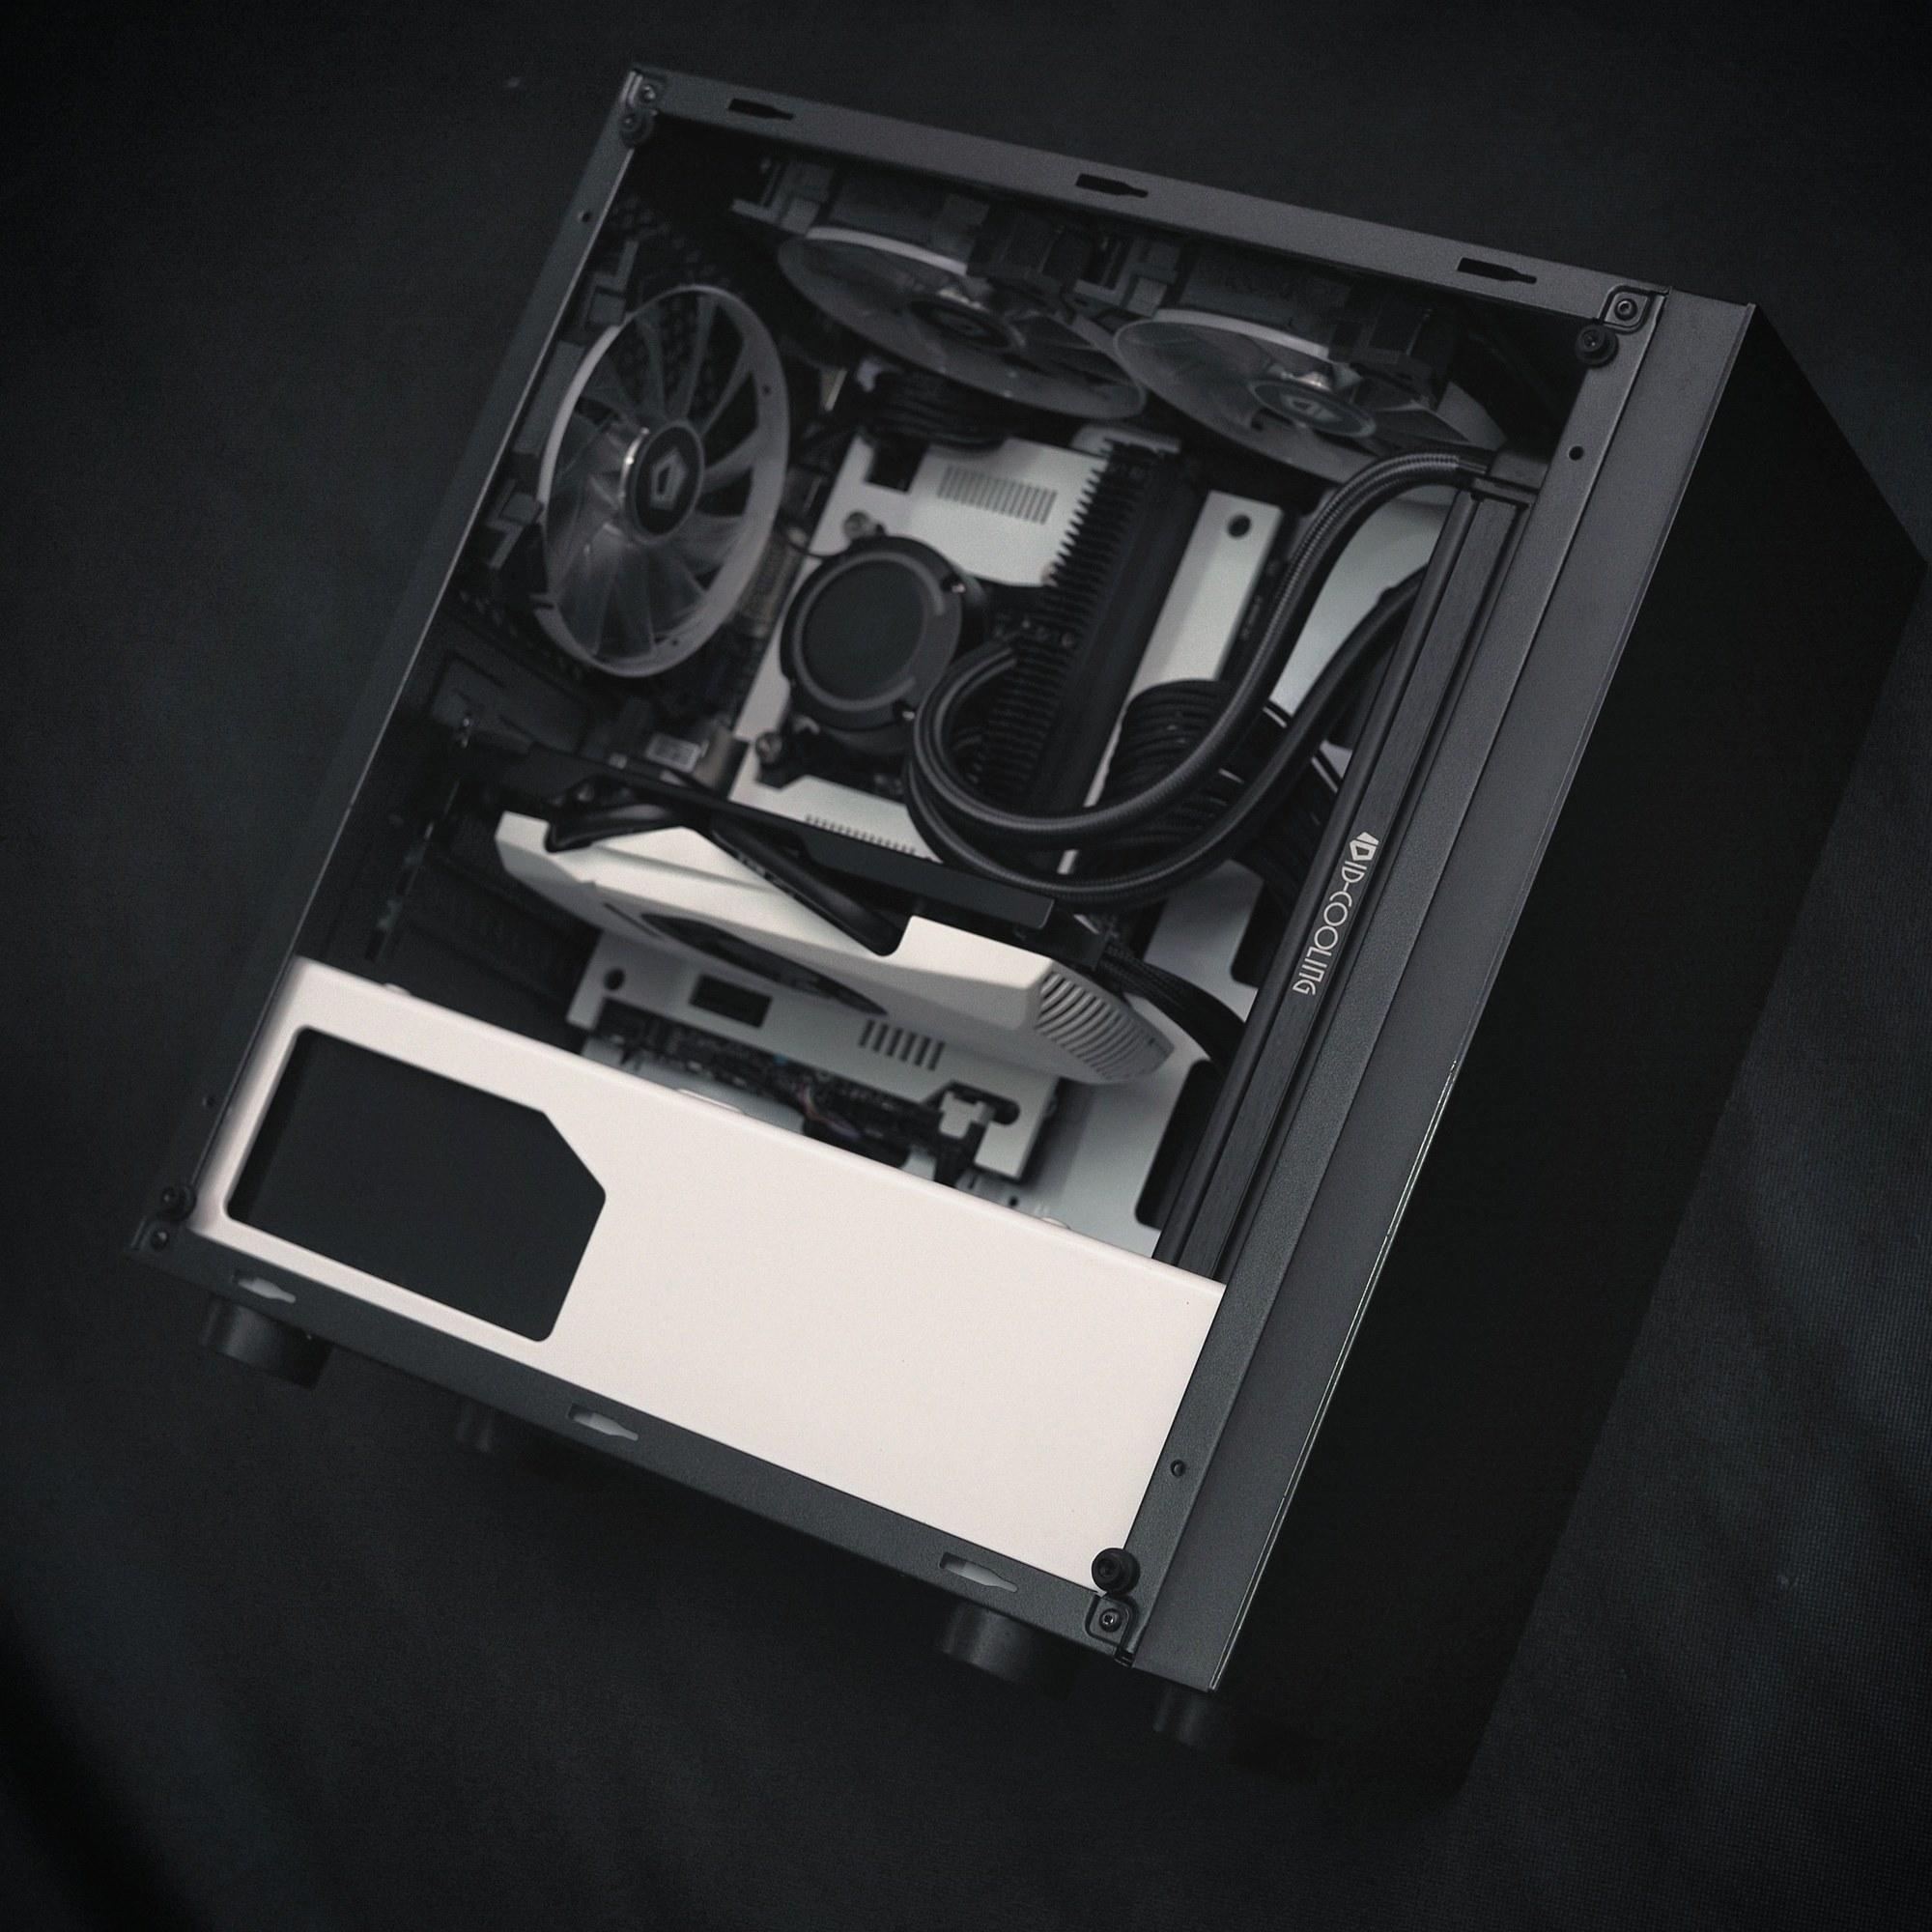 Tantric Mods Nexus M B/W